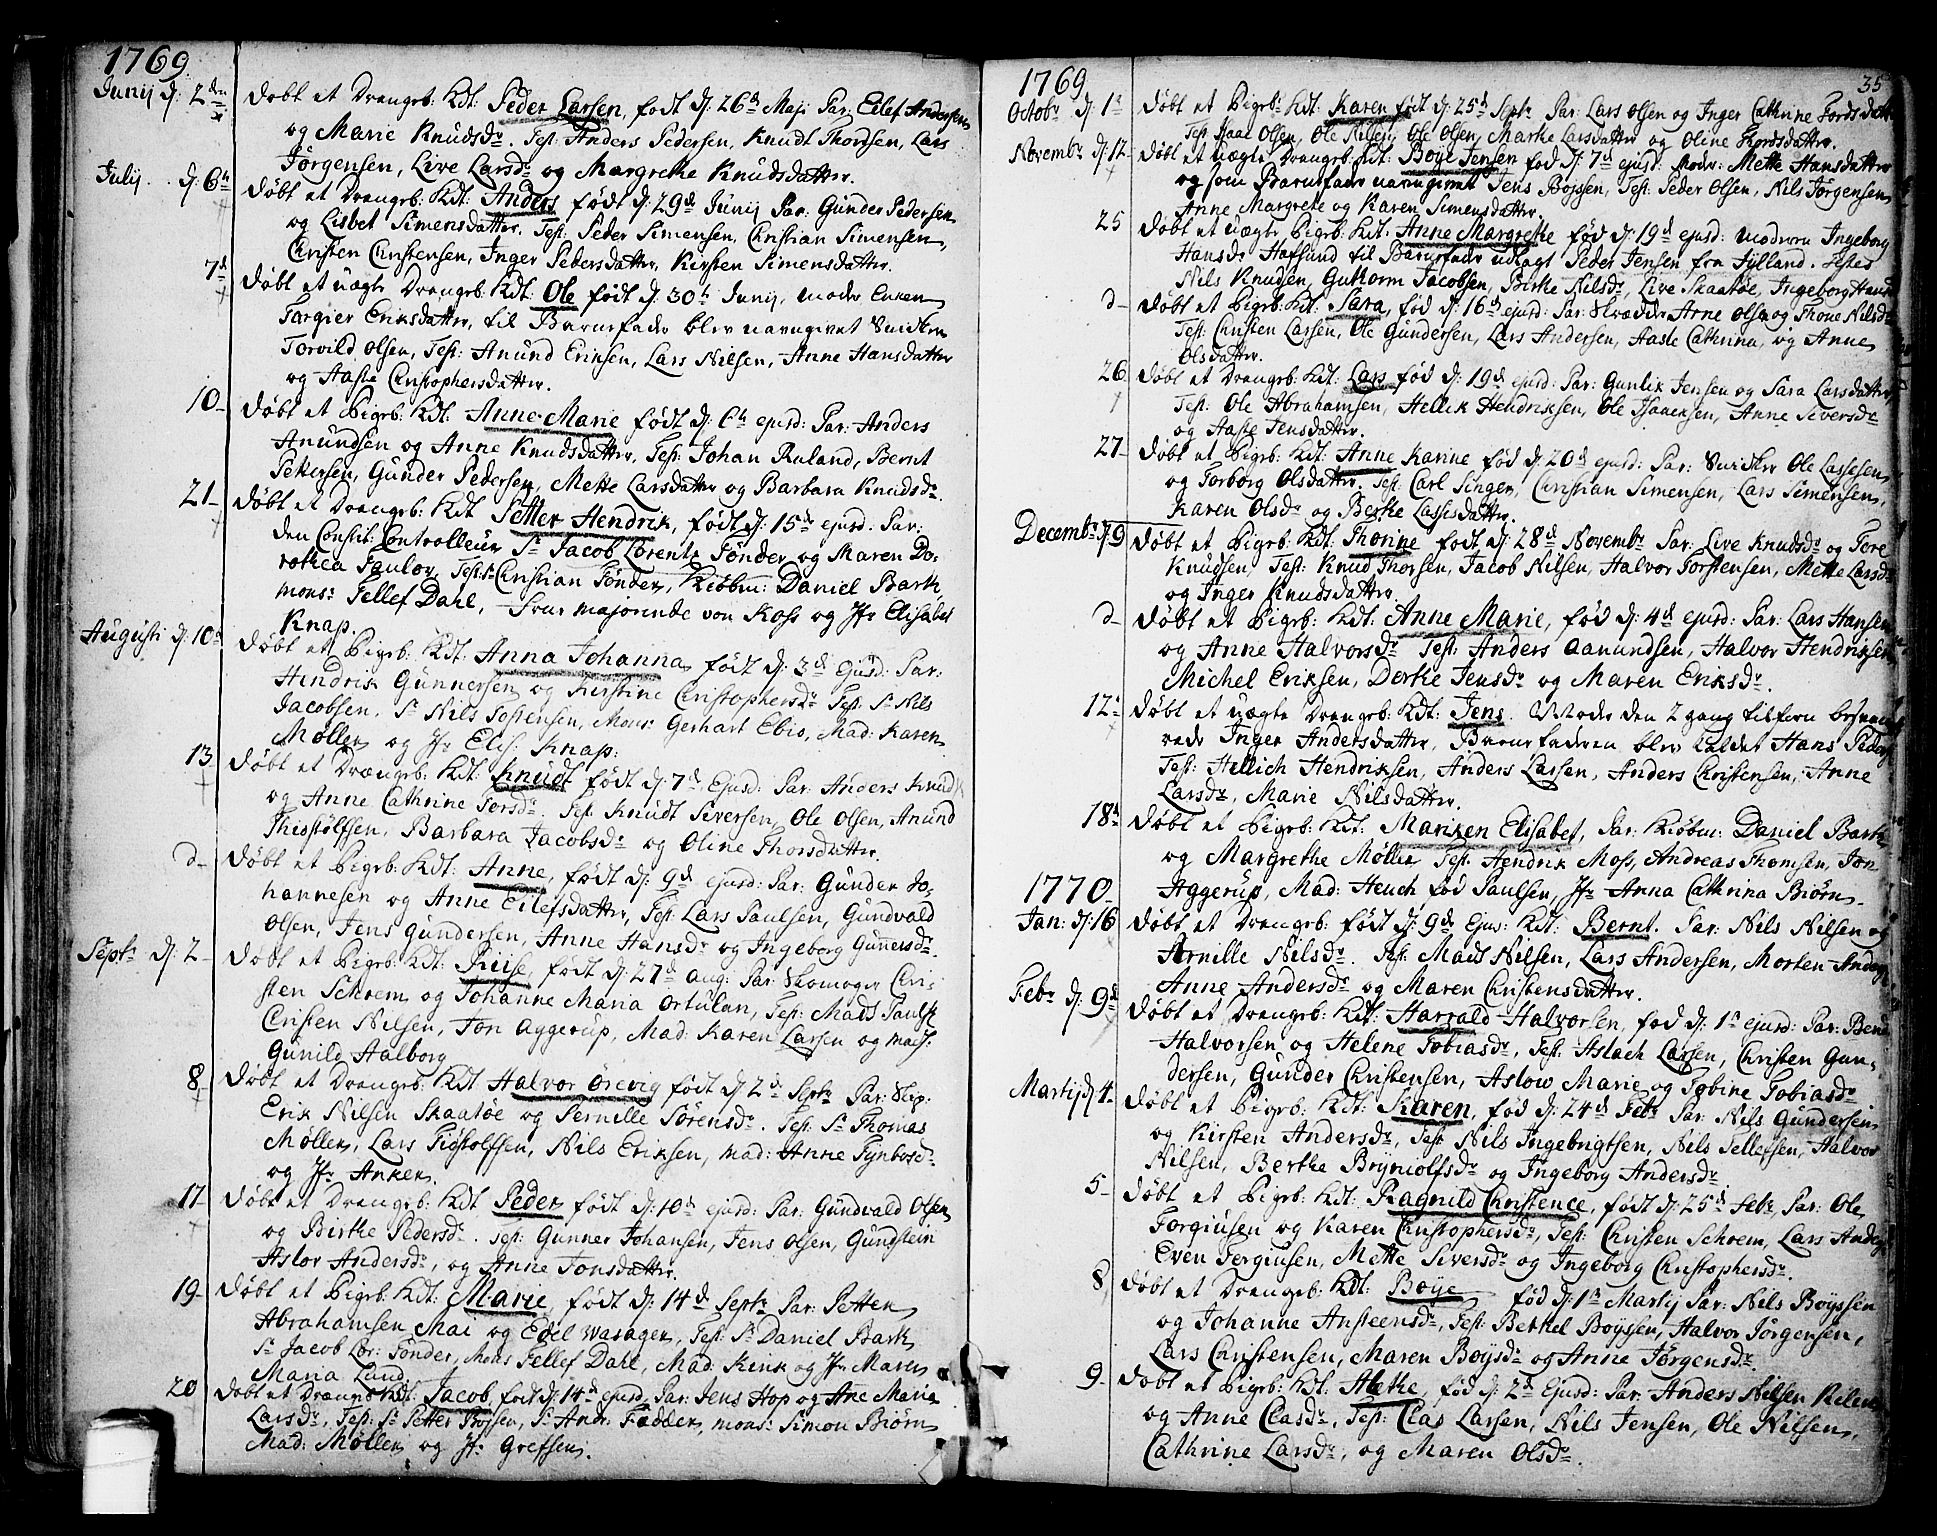 SAKO, Kragerø kirkebøker, F/Fa/L0002: Ministerialbok nr. 2, 1767-1802, s. 35